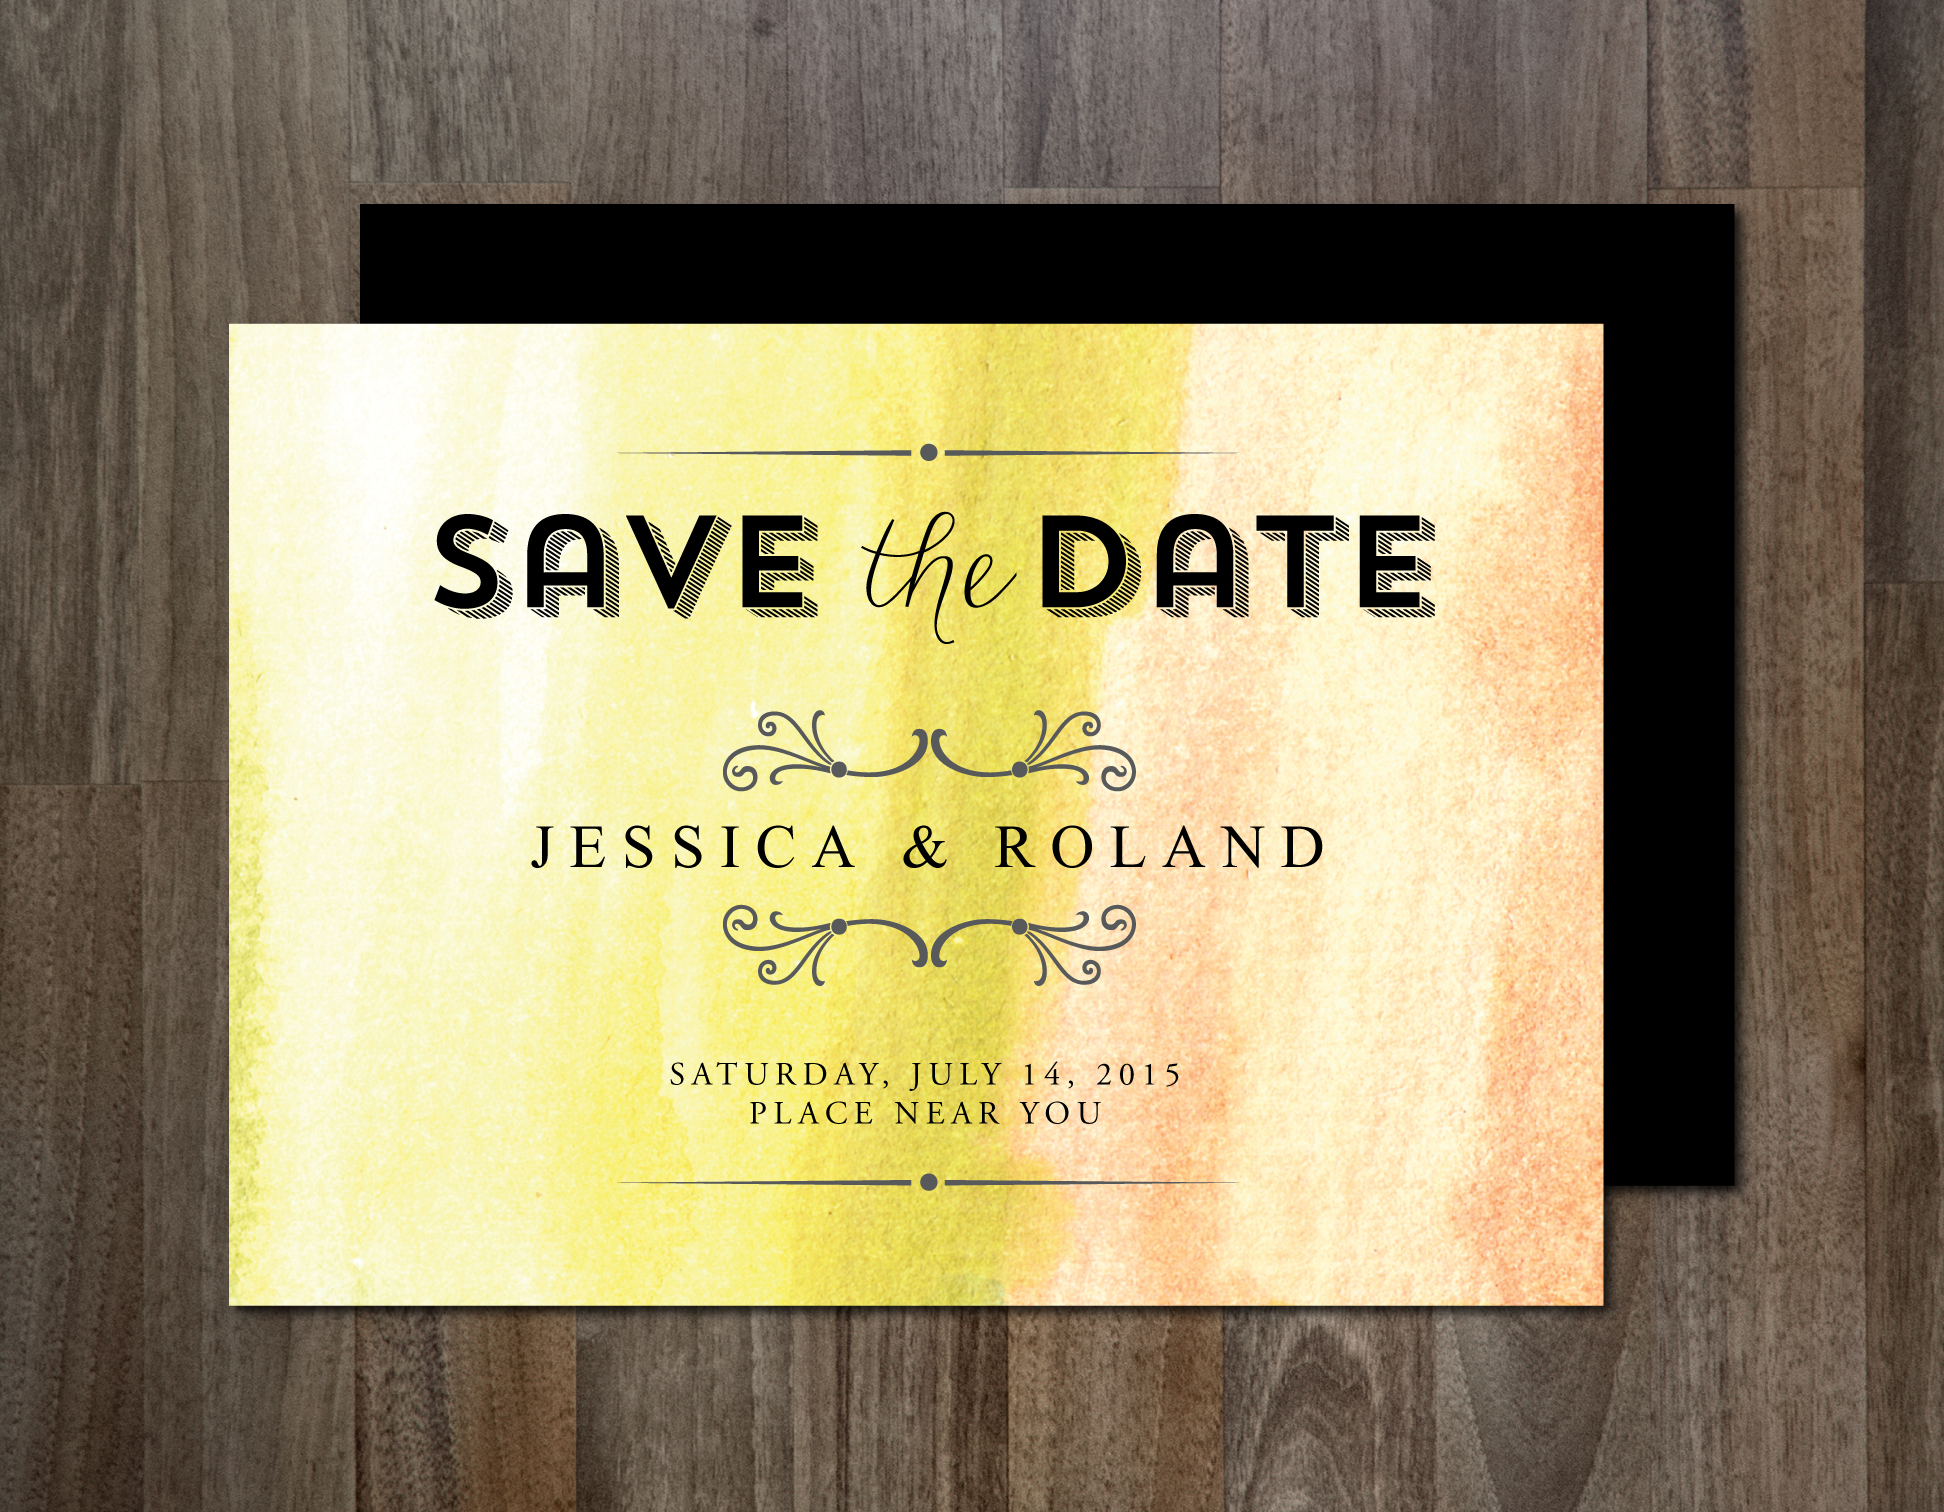 save the date invitation invitation templates on creative market. Black Bedroom Furniture Sets. Home Design Ideas